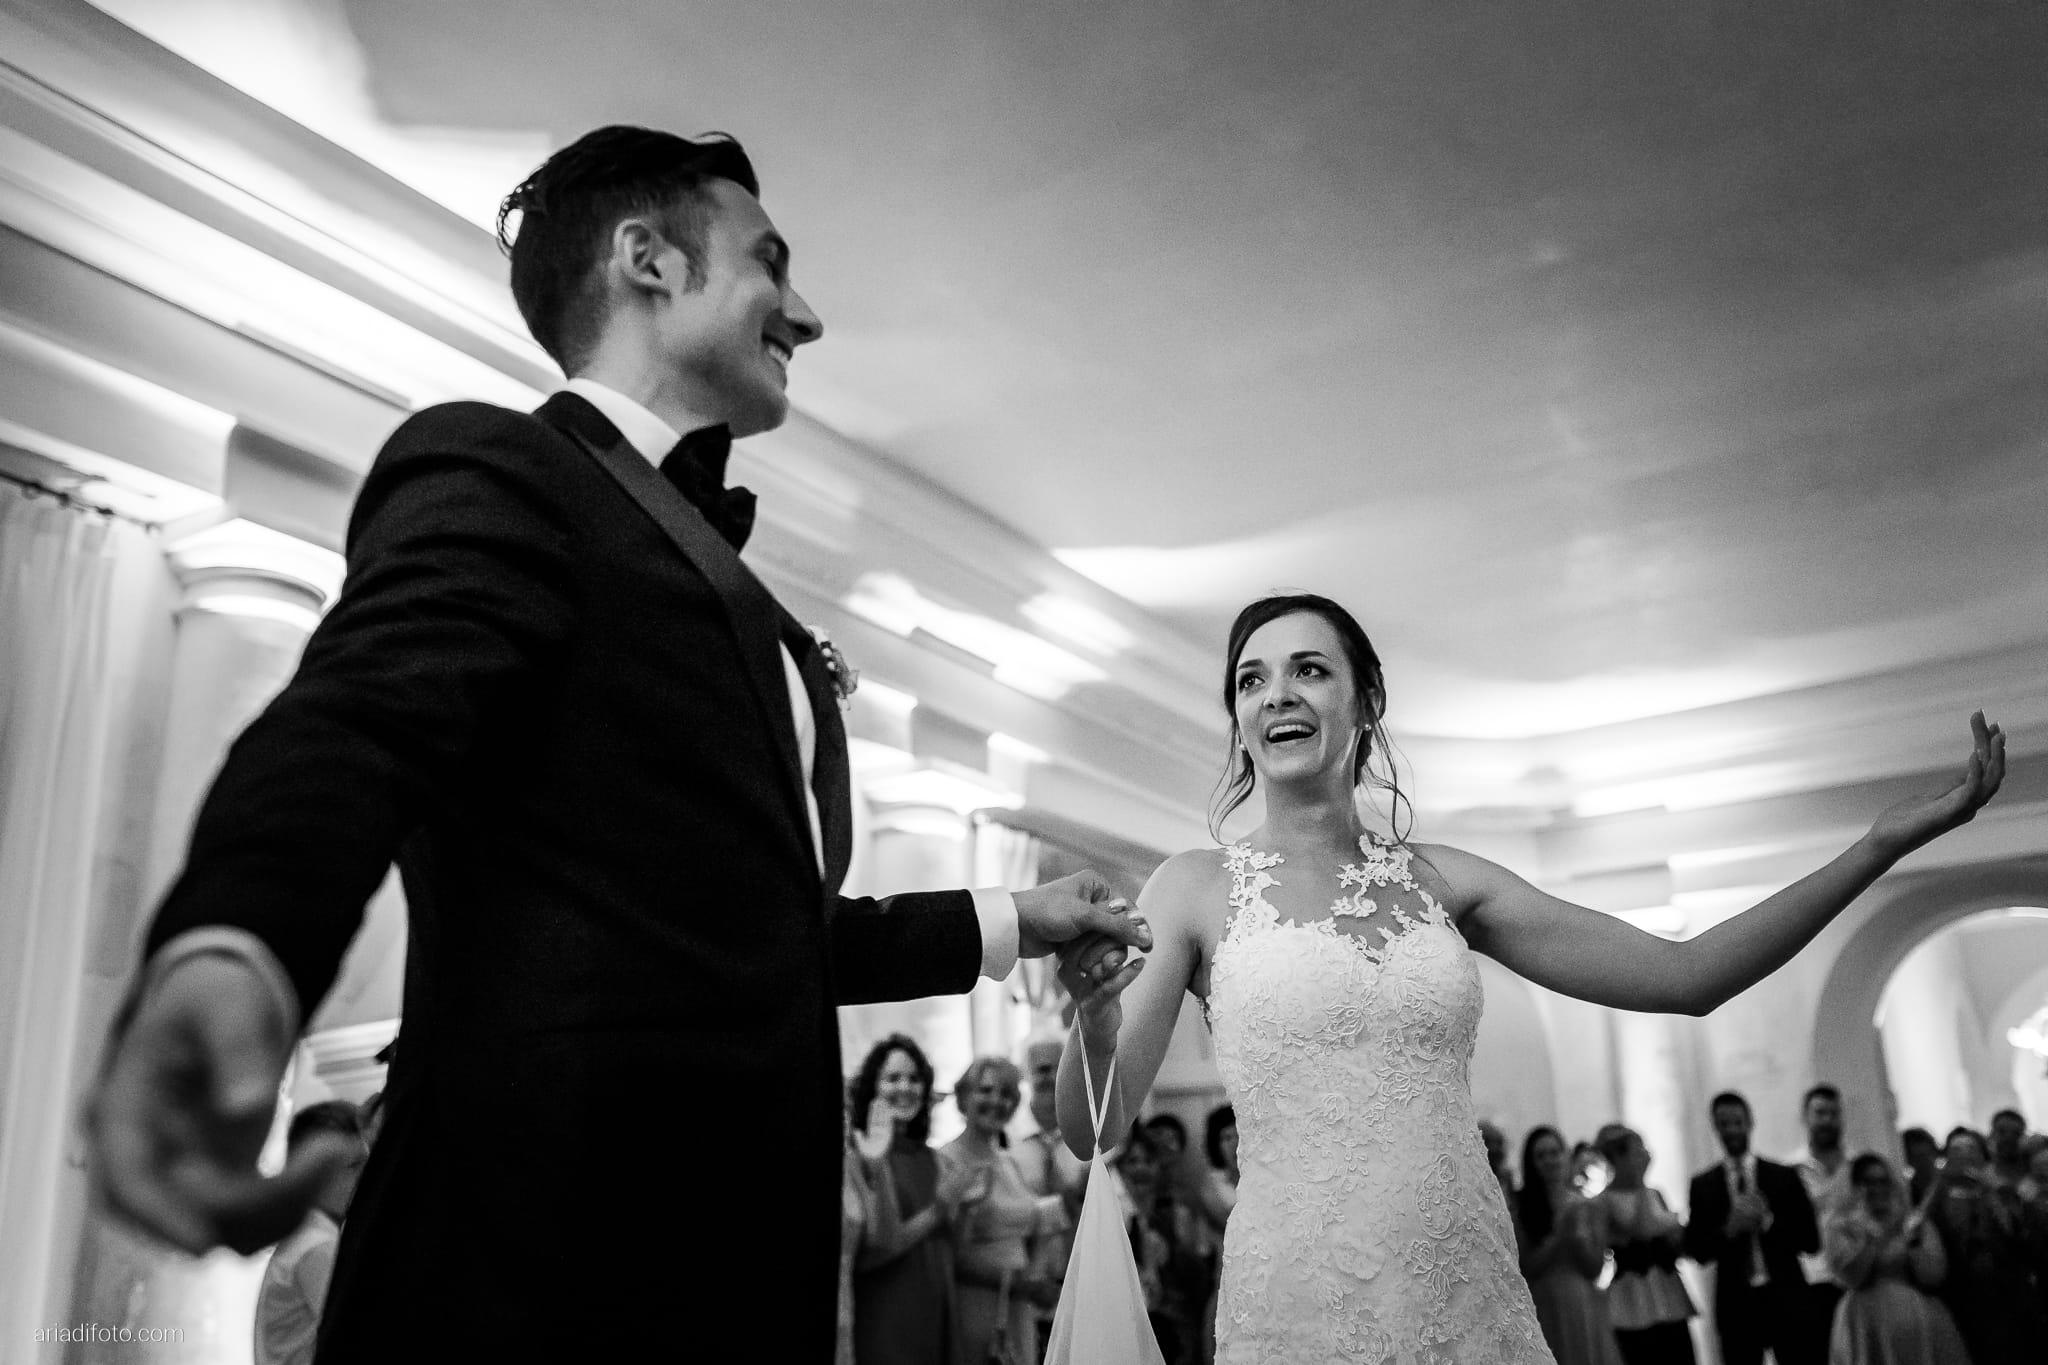 Valentina Marco Matrimonio Duomo Gorizia Castelvecchio Sagrado ricevimento primo ballo valzer